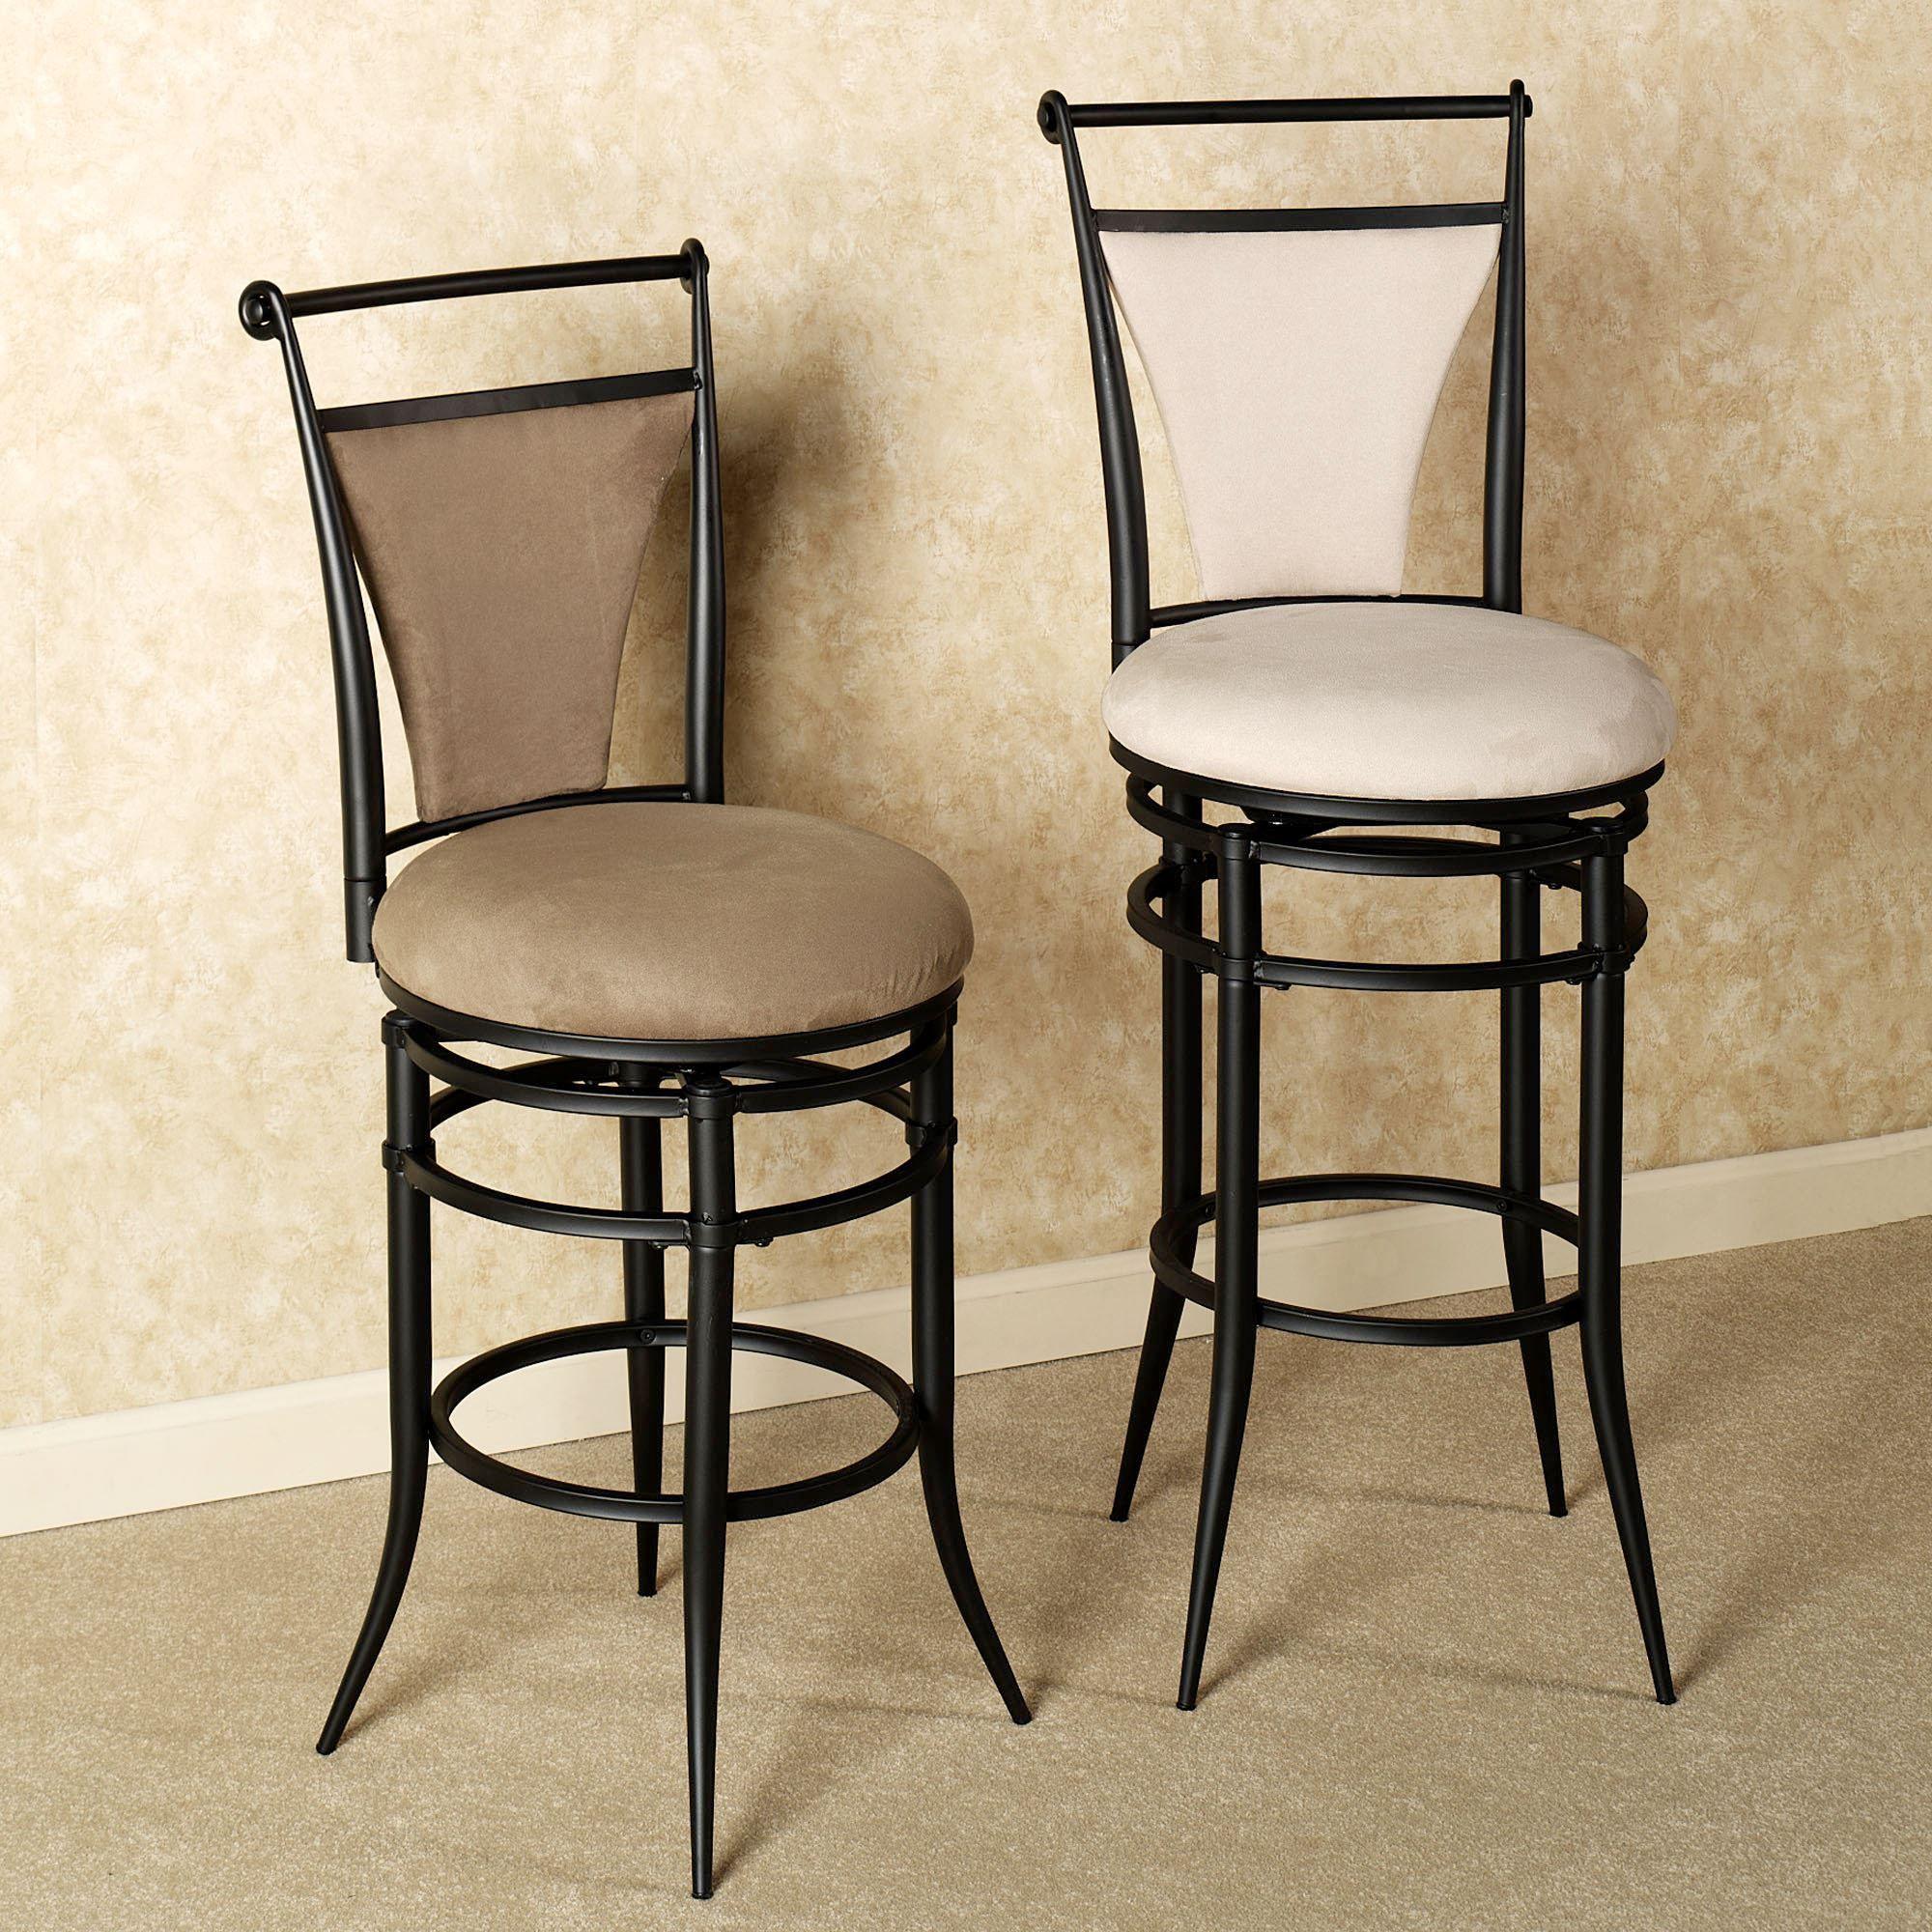 Astounding Camira Cafe Metal Bar And Counter Stools Creativecarmelina Interior Chair Design Creativecarmelinacom